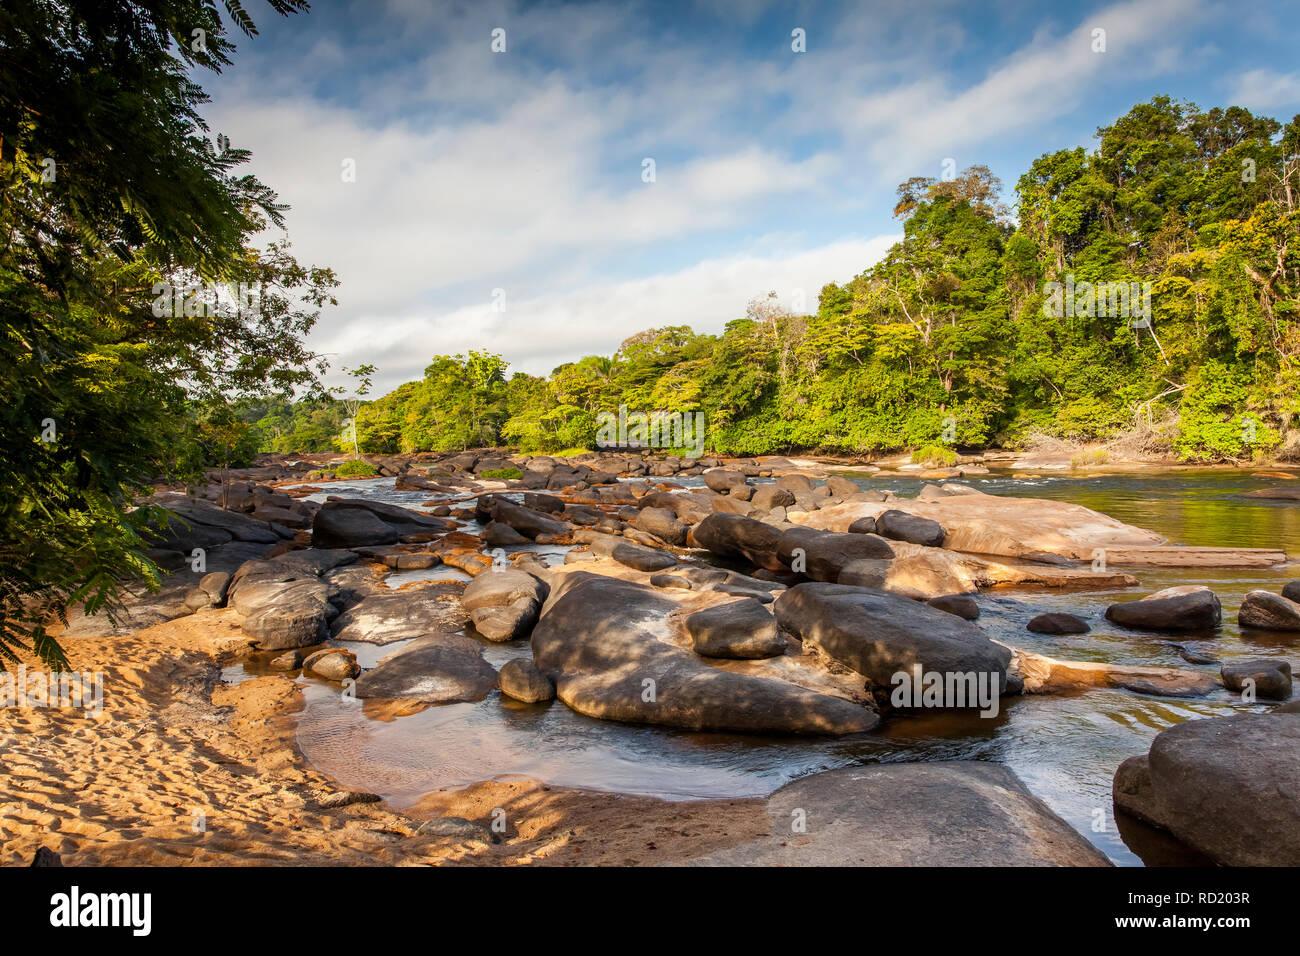 View on the Suriname river in Upper Suriname, Awarradam jungle camp - Stock Image